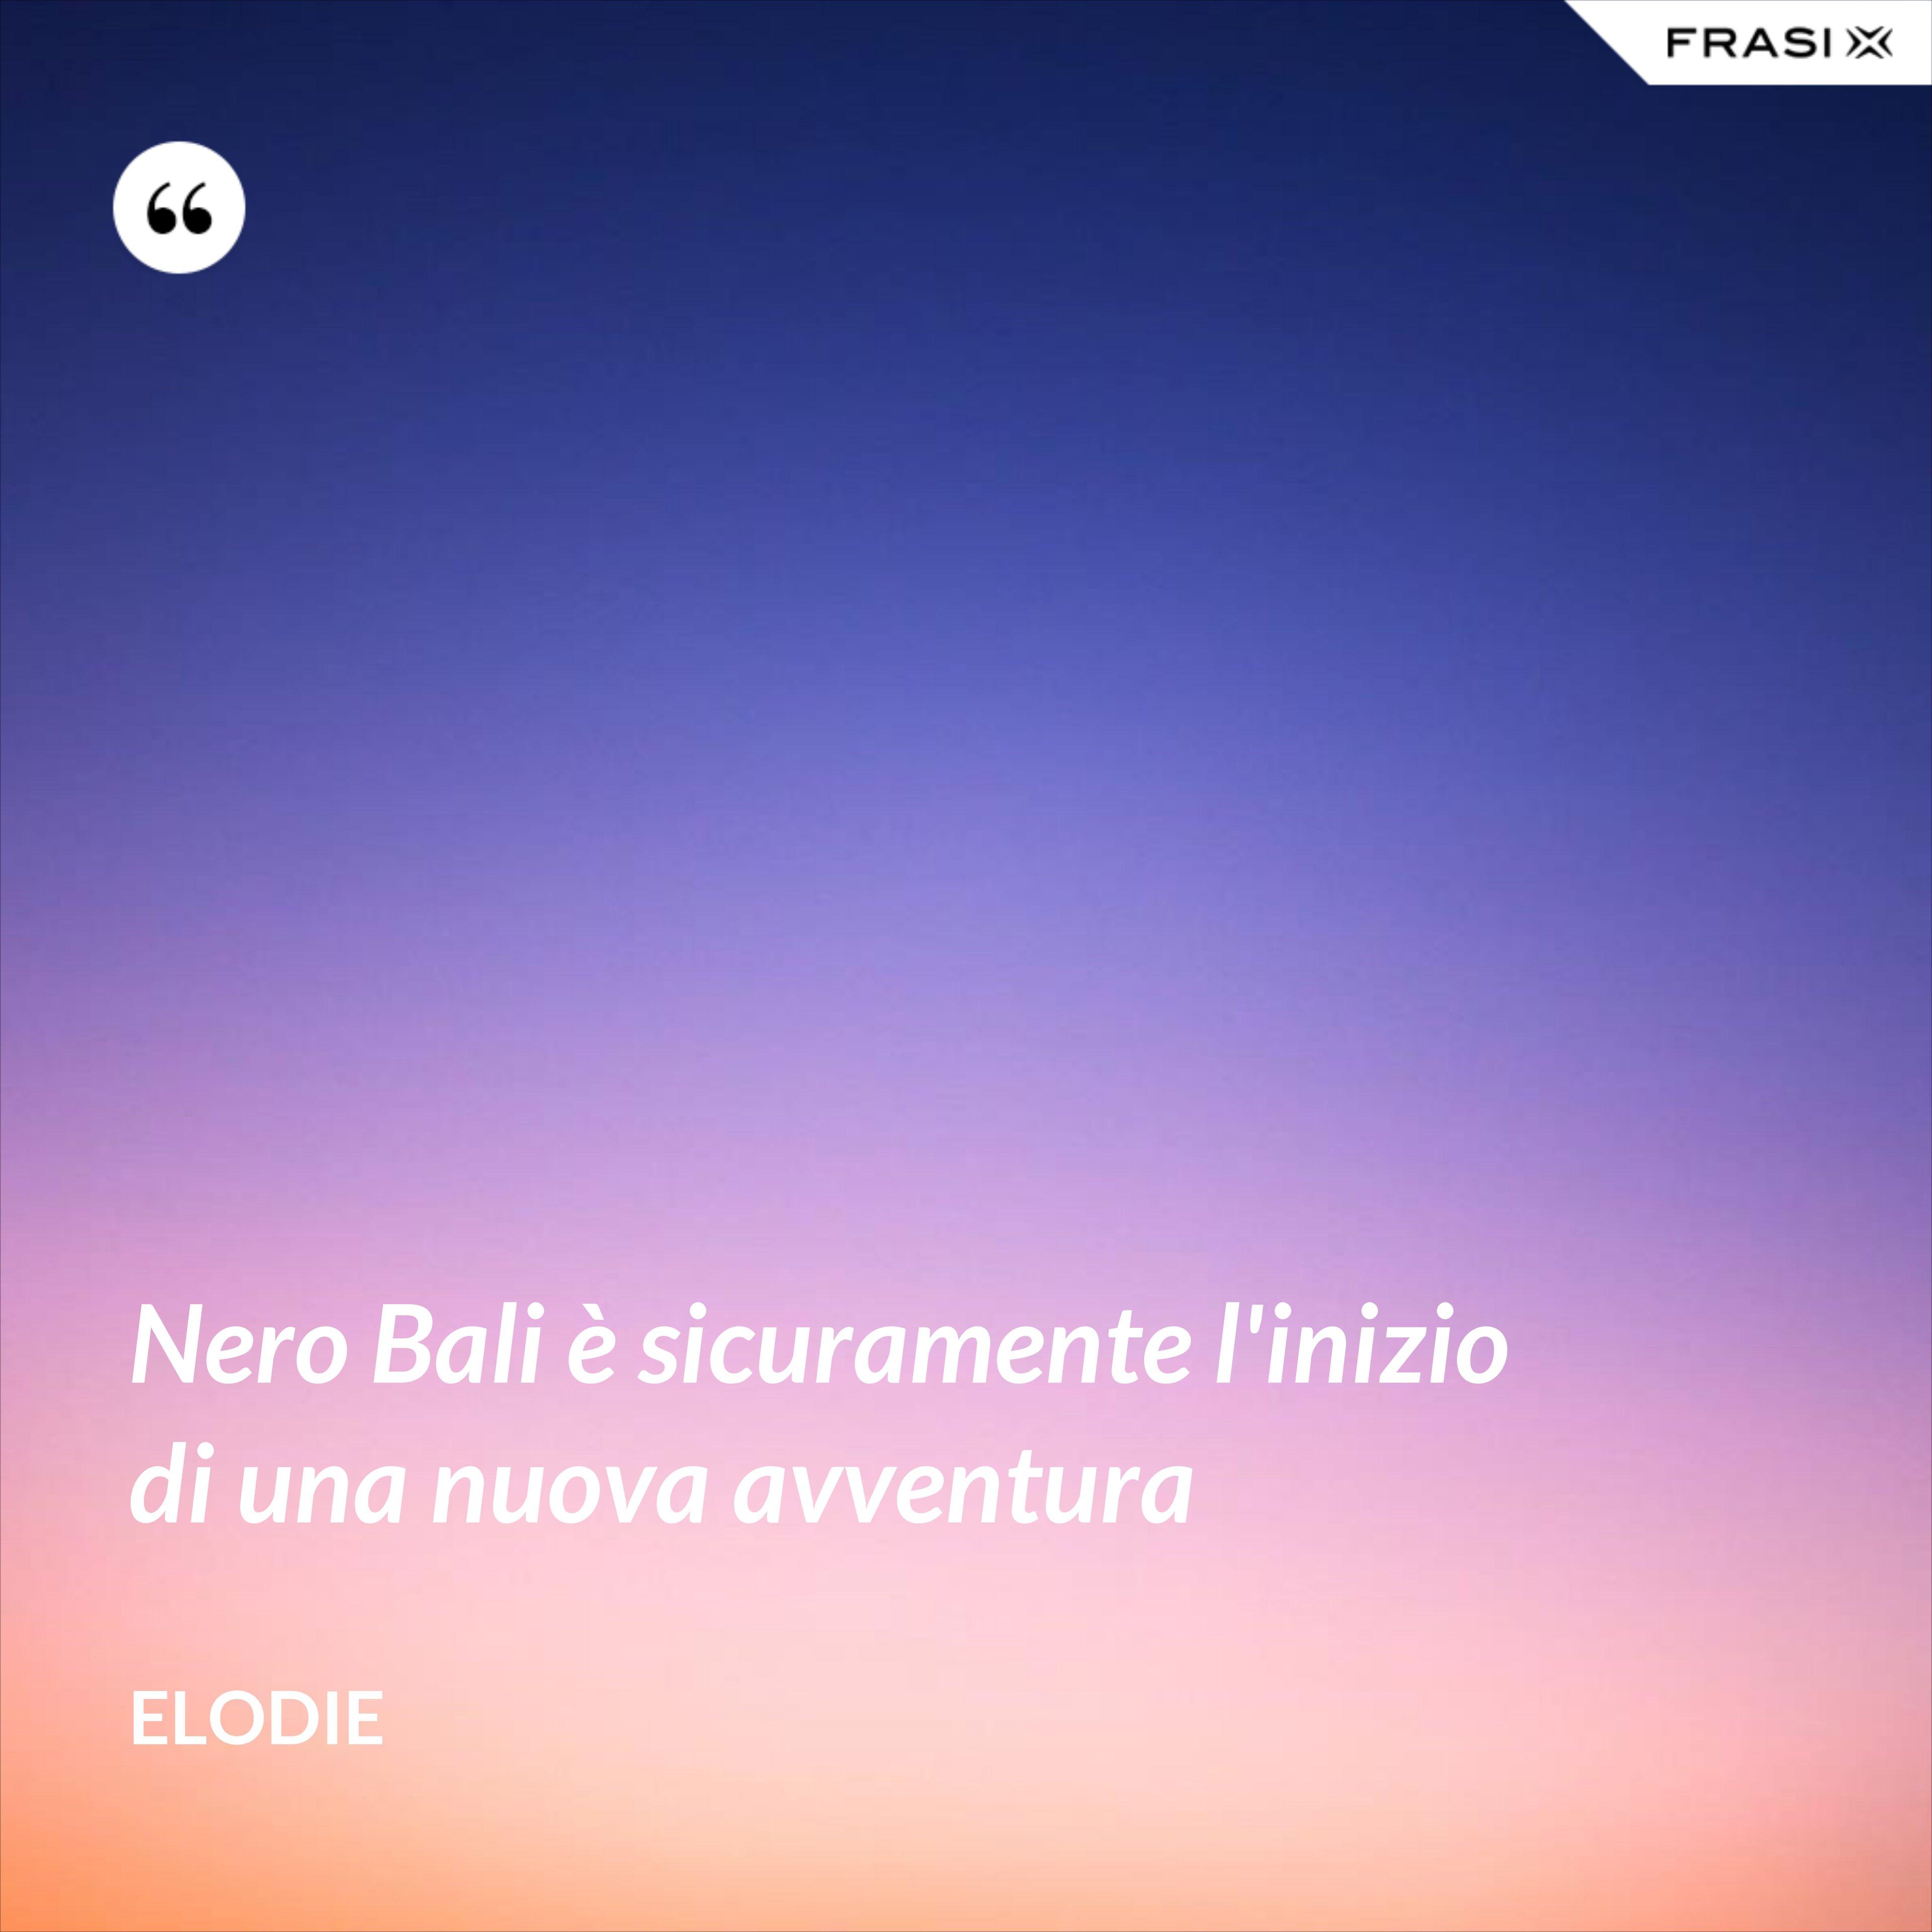 Nero Bali è sicuramente l'inizio di una nuova avventura - Elodie